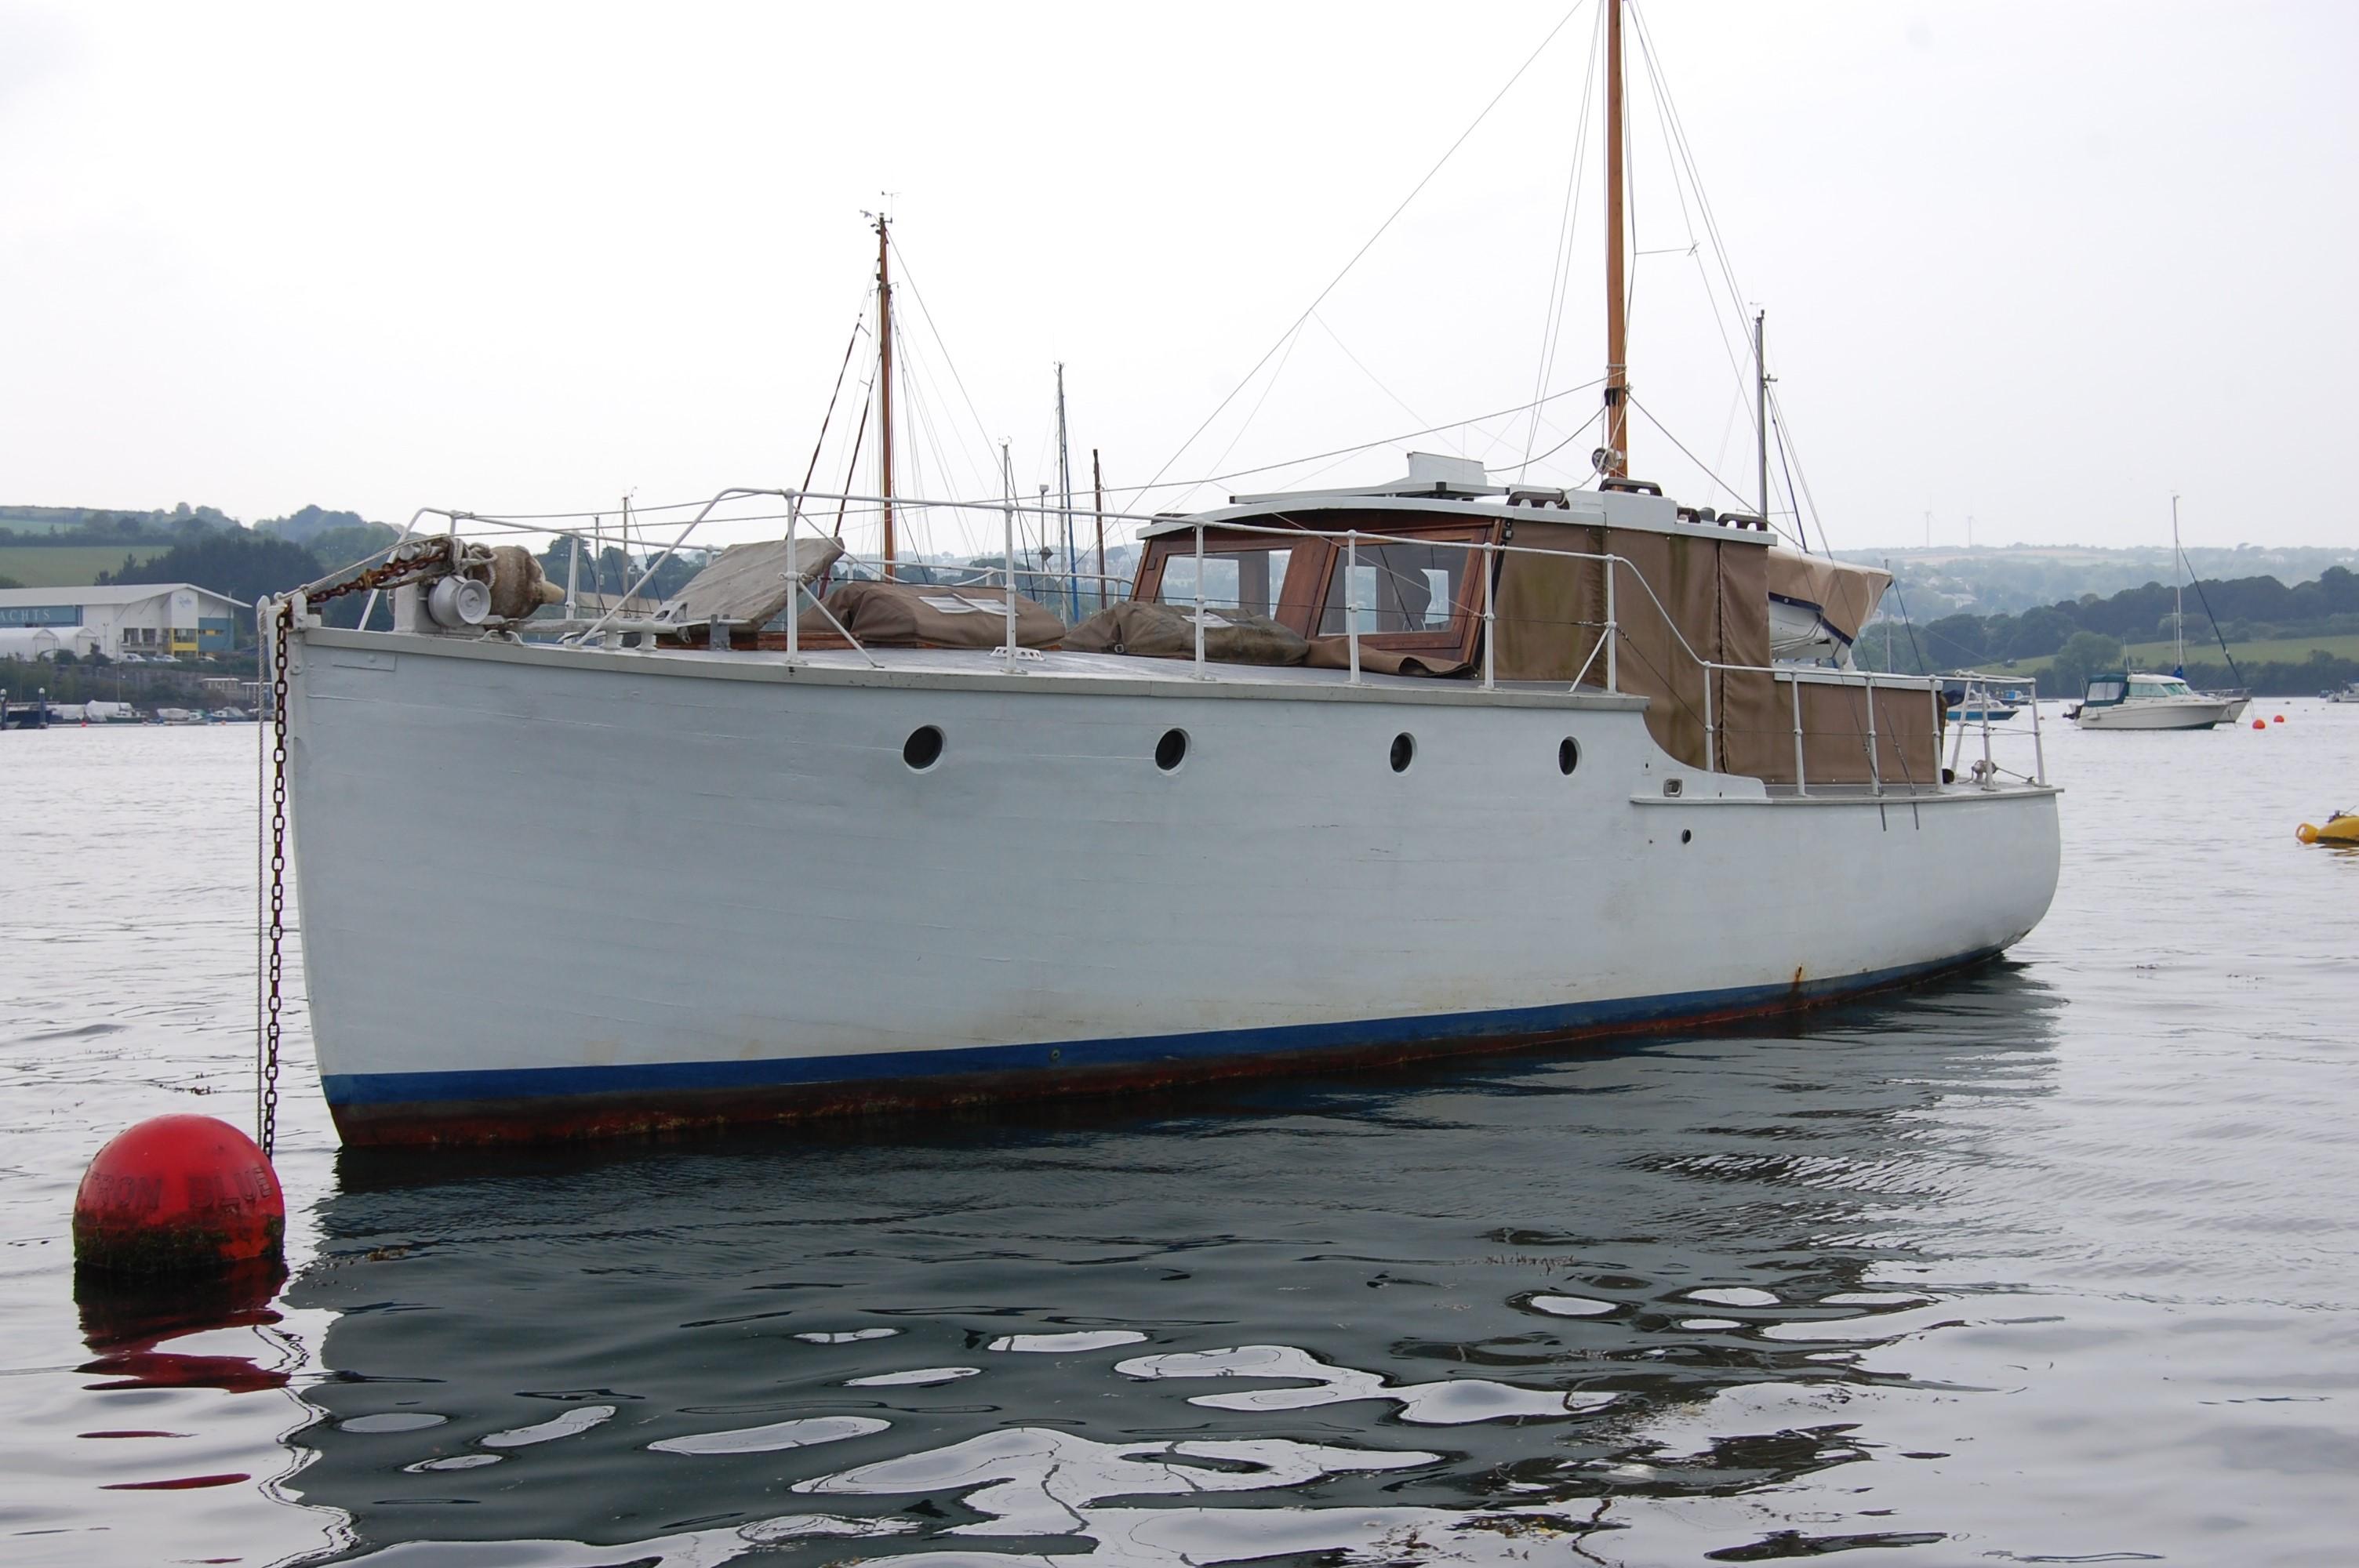 Silver Class Motor Yacht Miss Silver Silver Class Motor Yacht Miss Silver